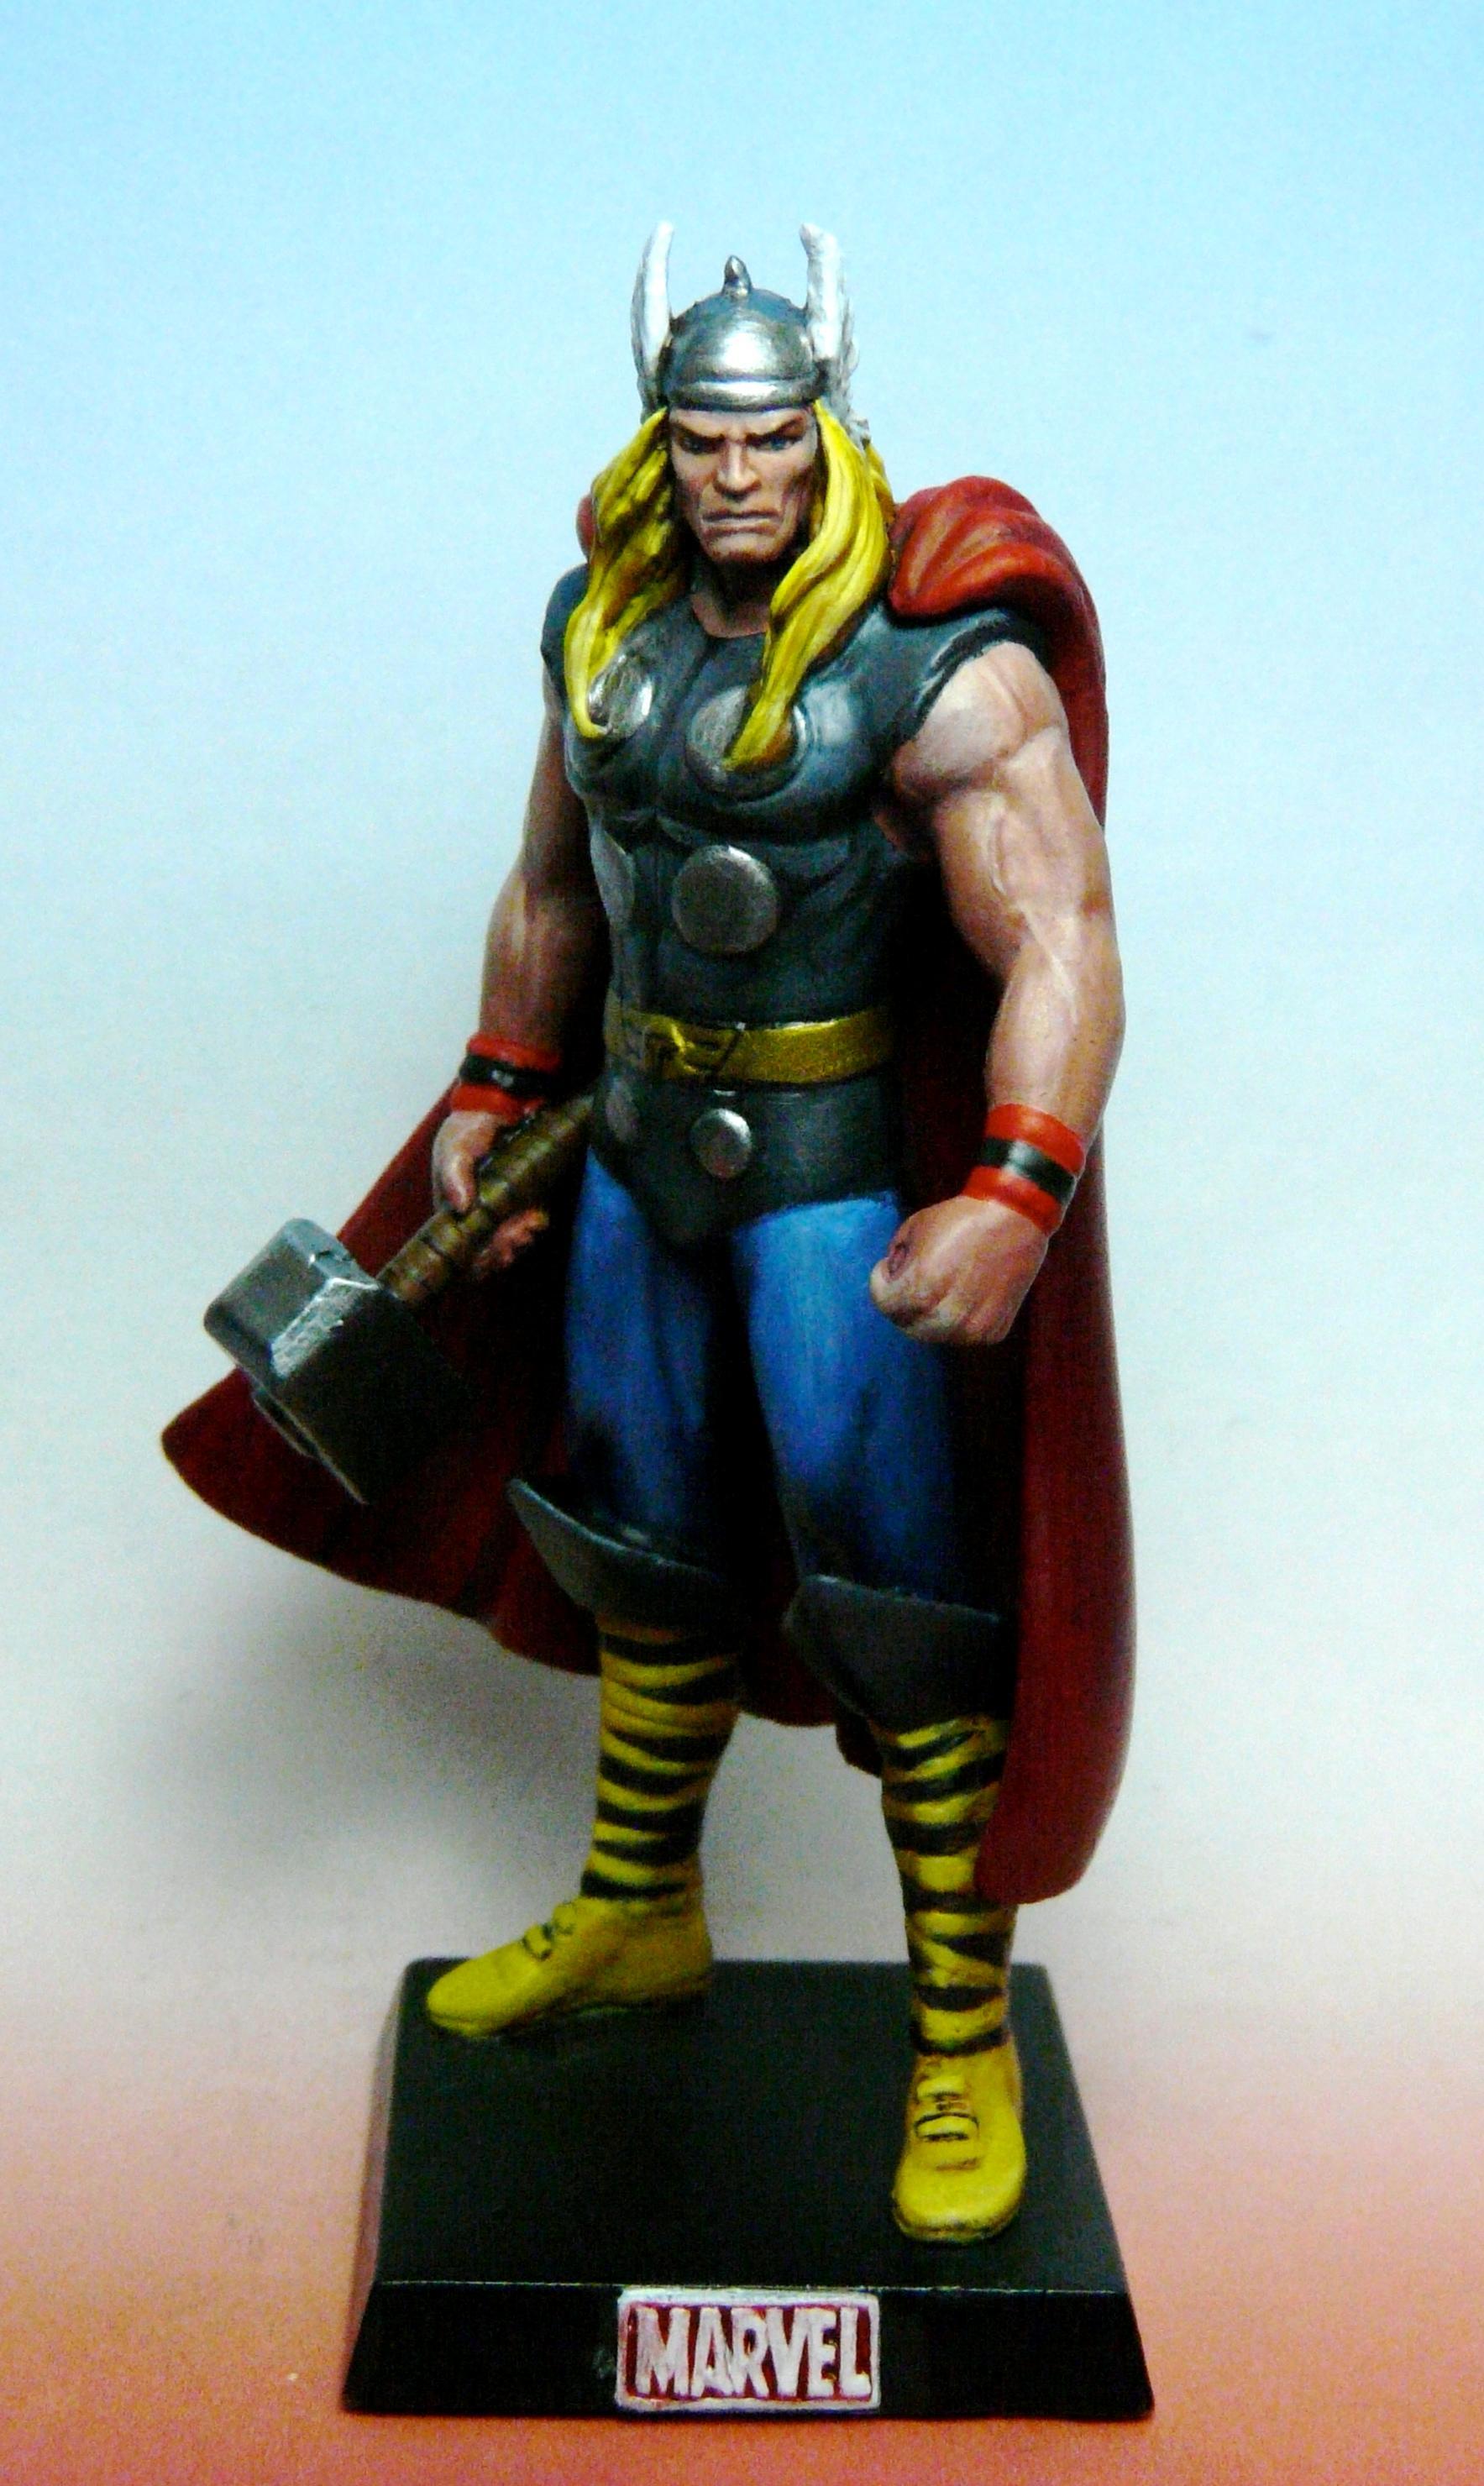 Avengers, Comics, Marvel, Superhero, Thor